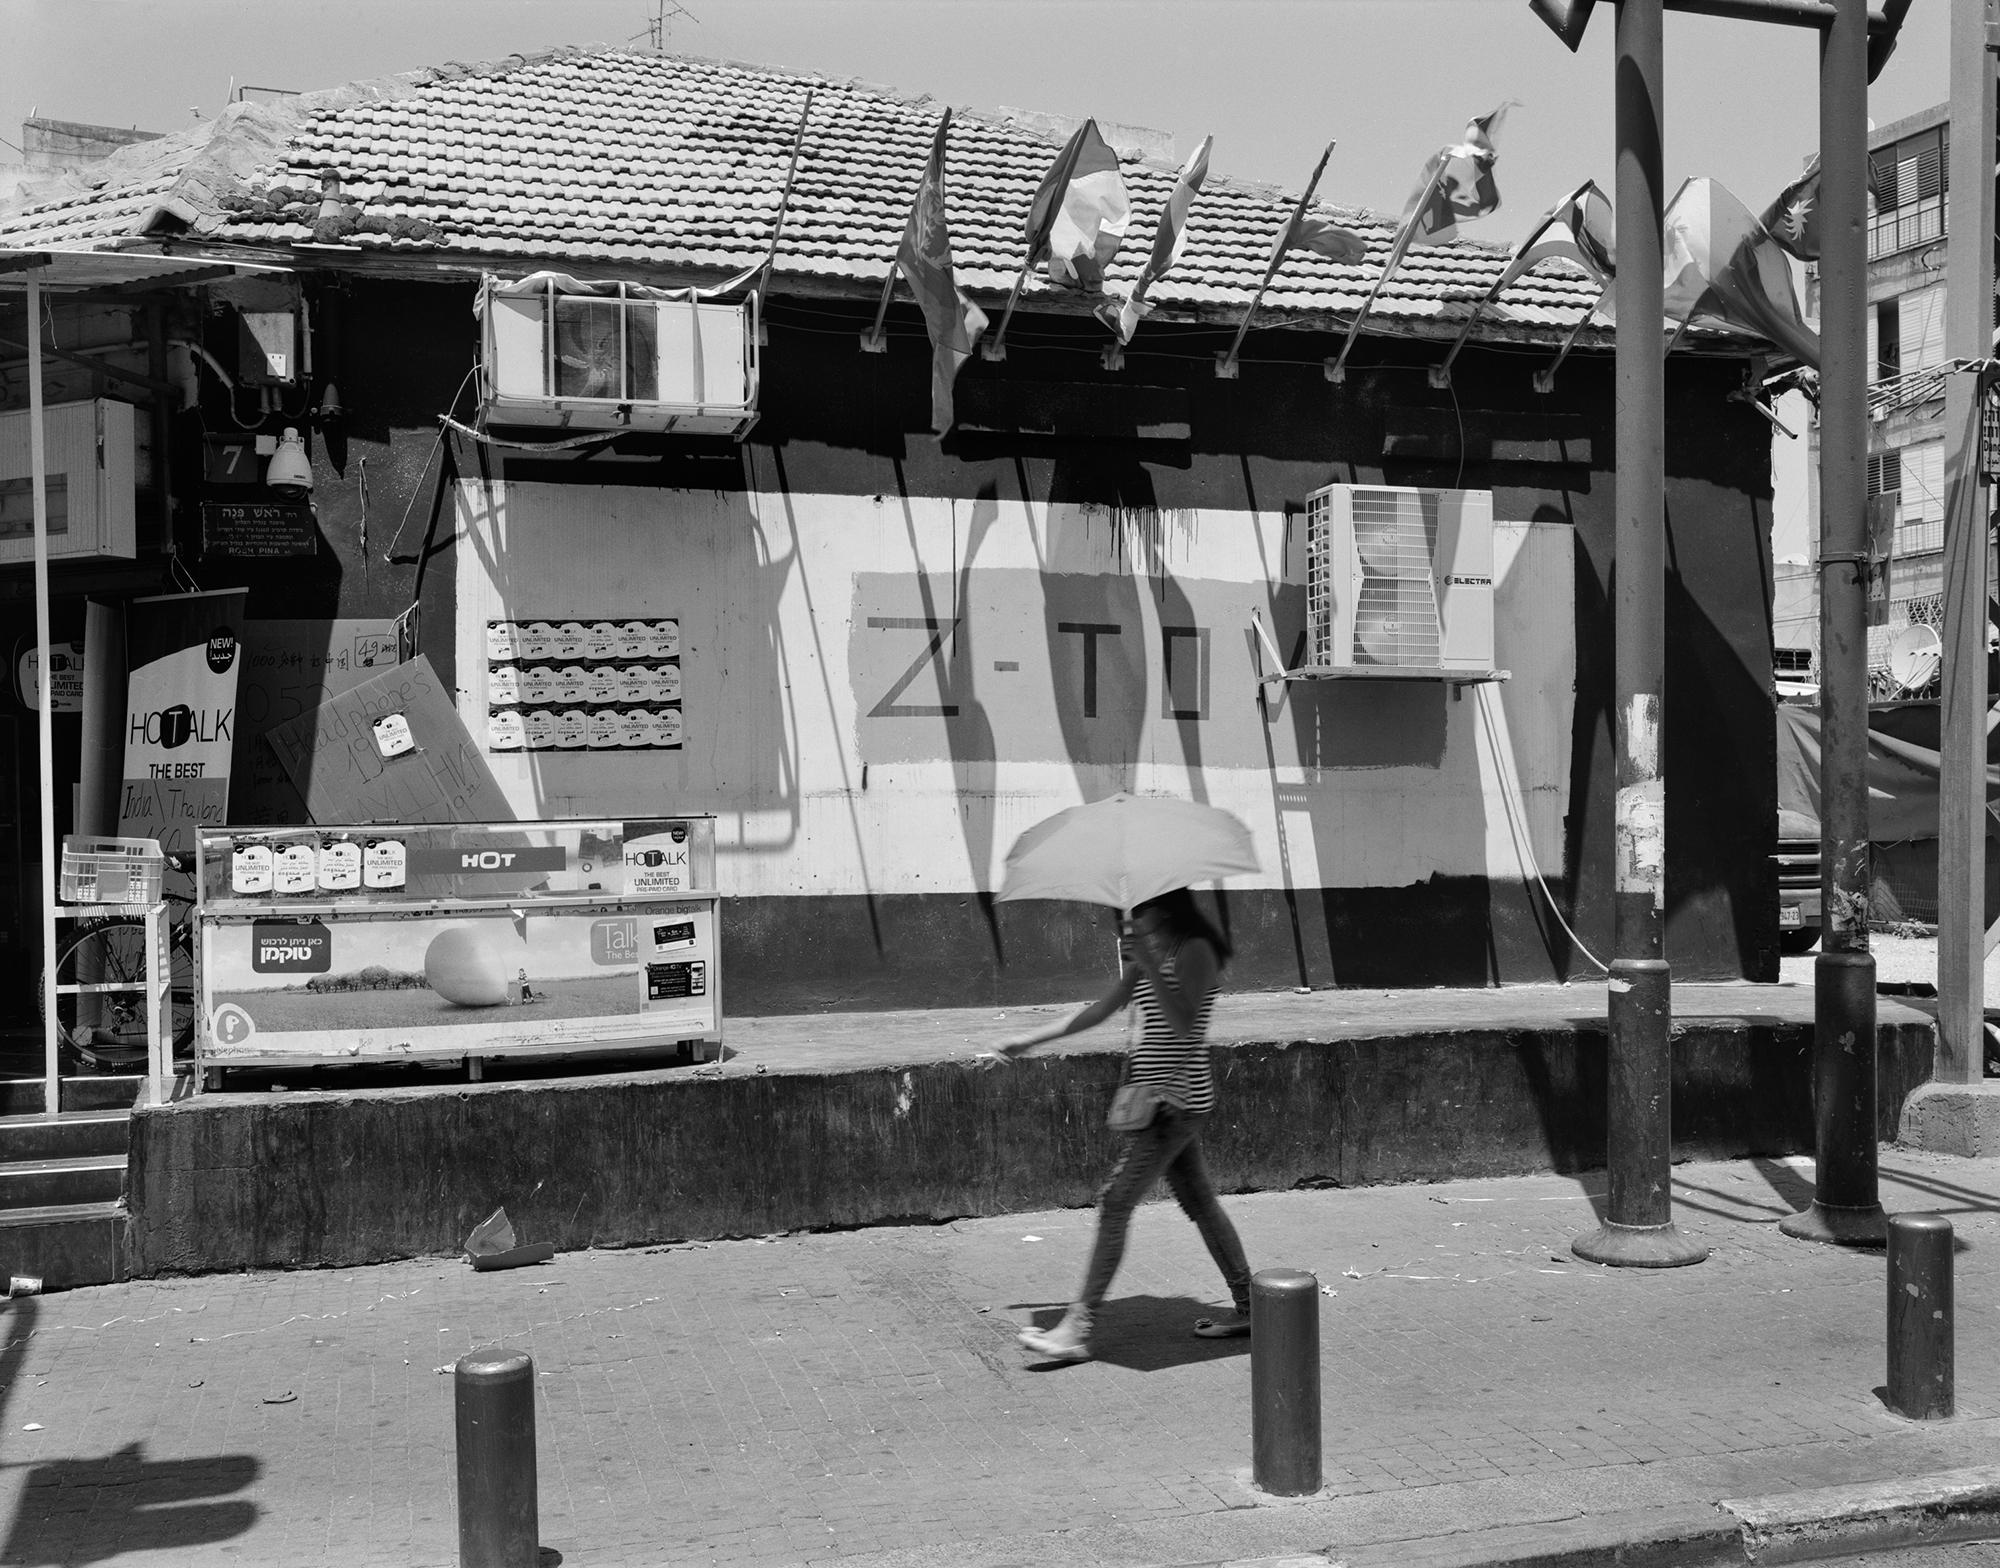 Rosh Pina Street, Neve Sha'anan, 2015